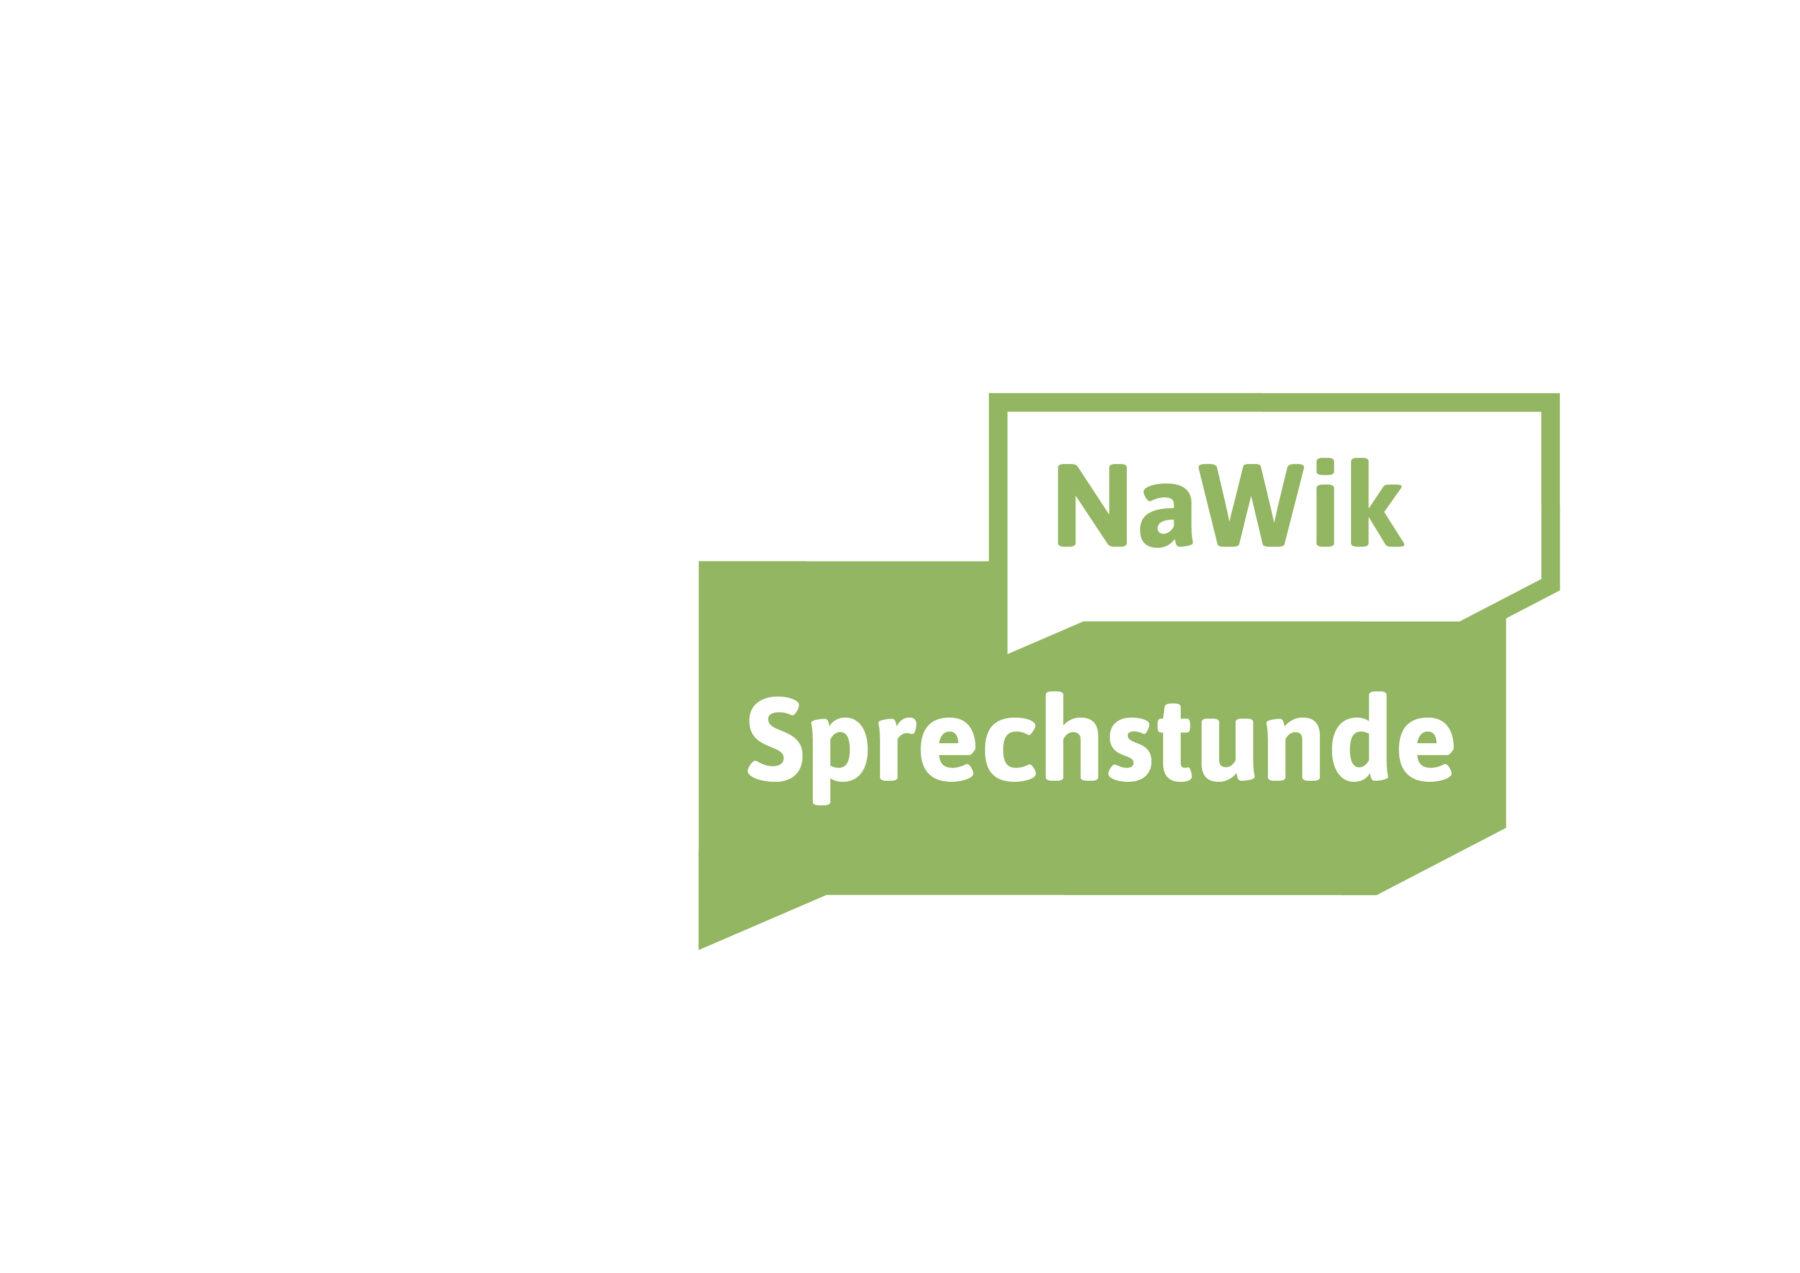 NaWik Sprechstunde Slider 02-01